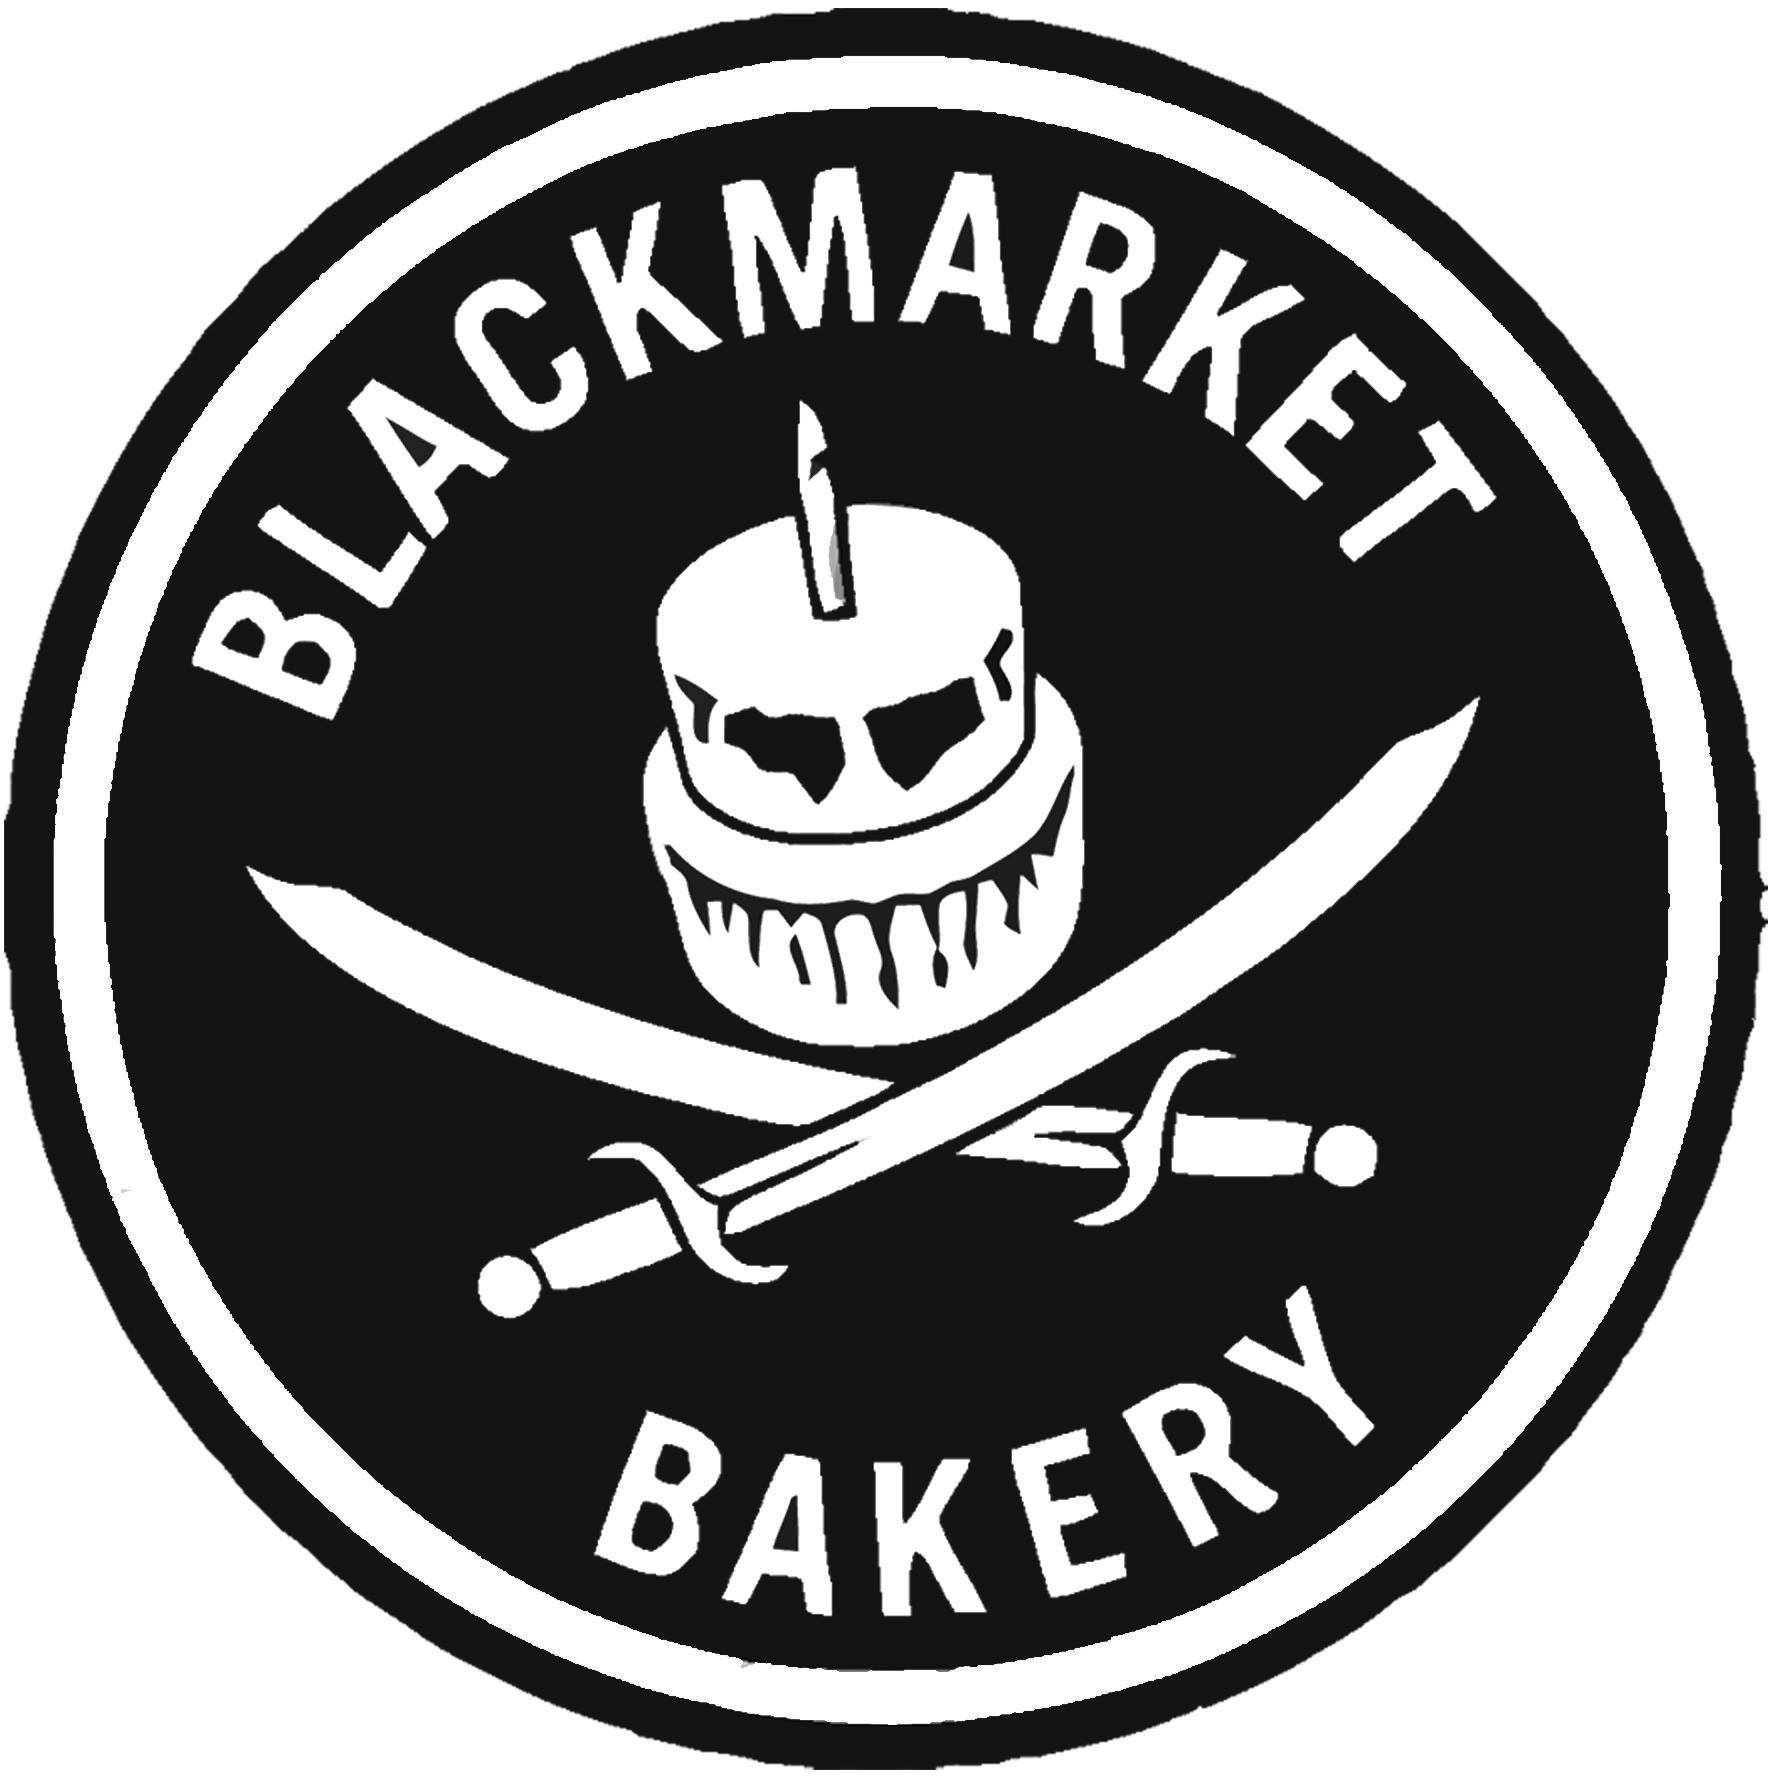 Blackmarket Bakery Costa Mesa Logo